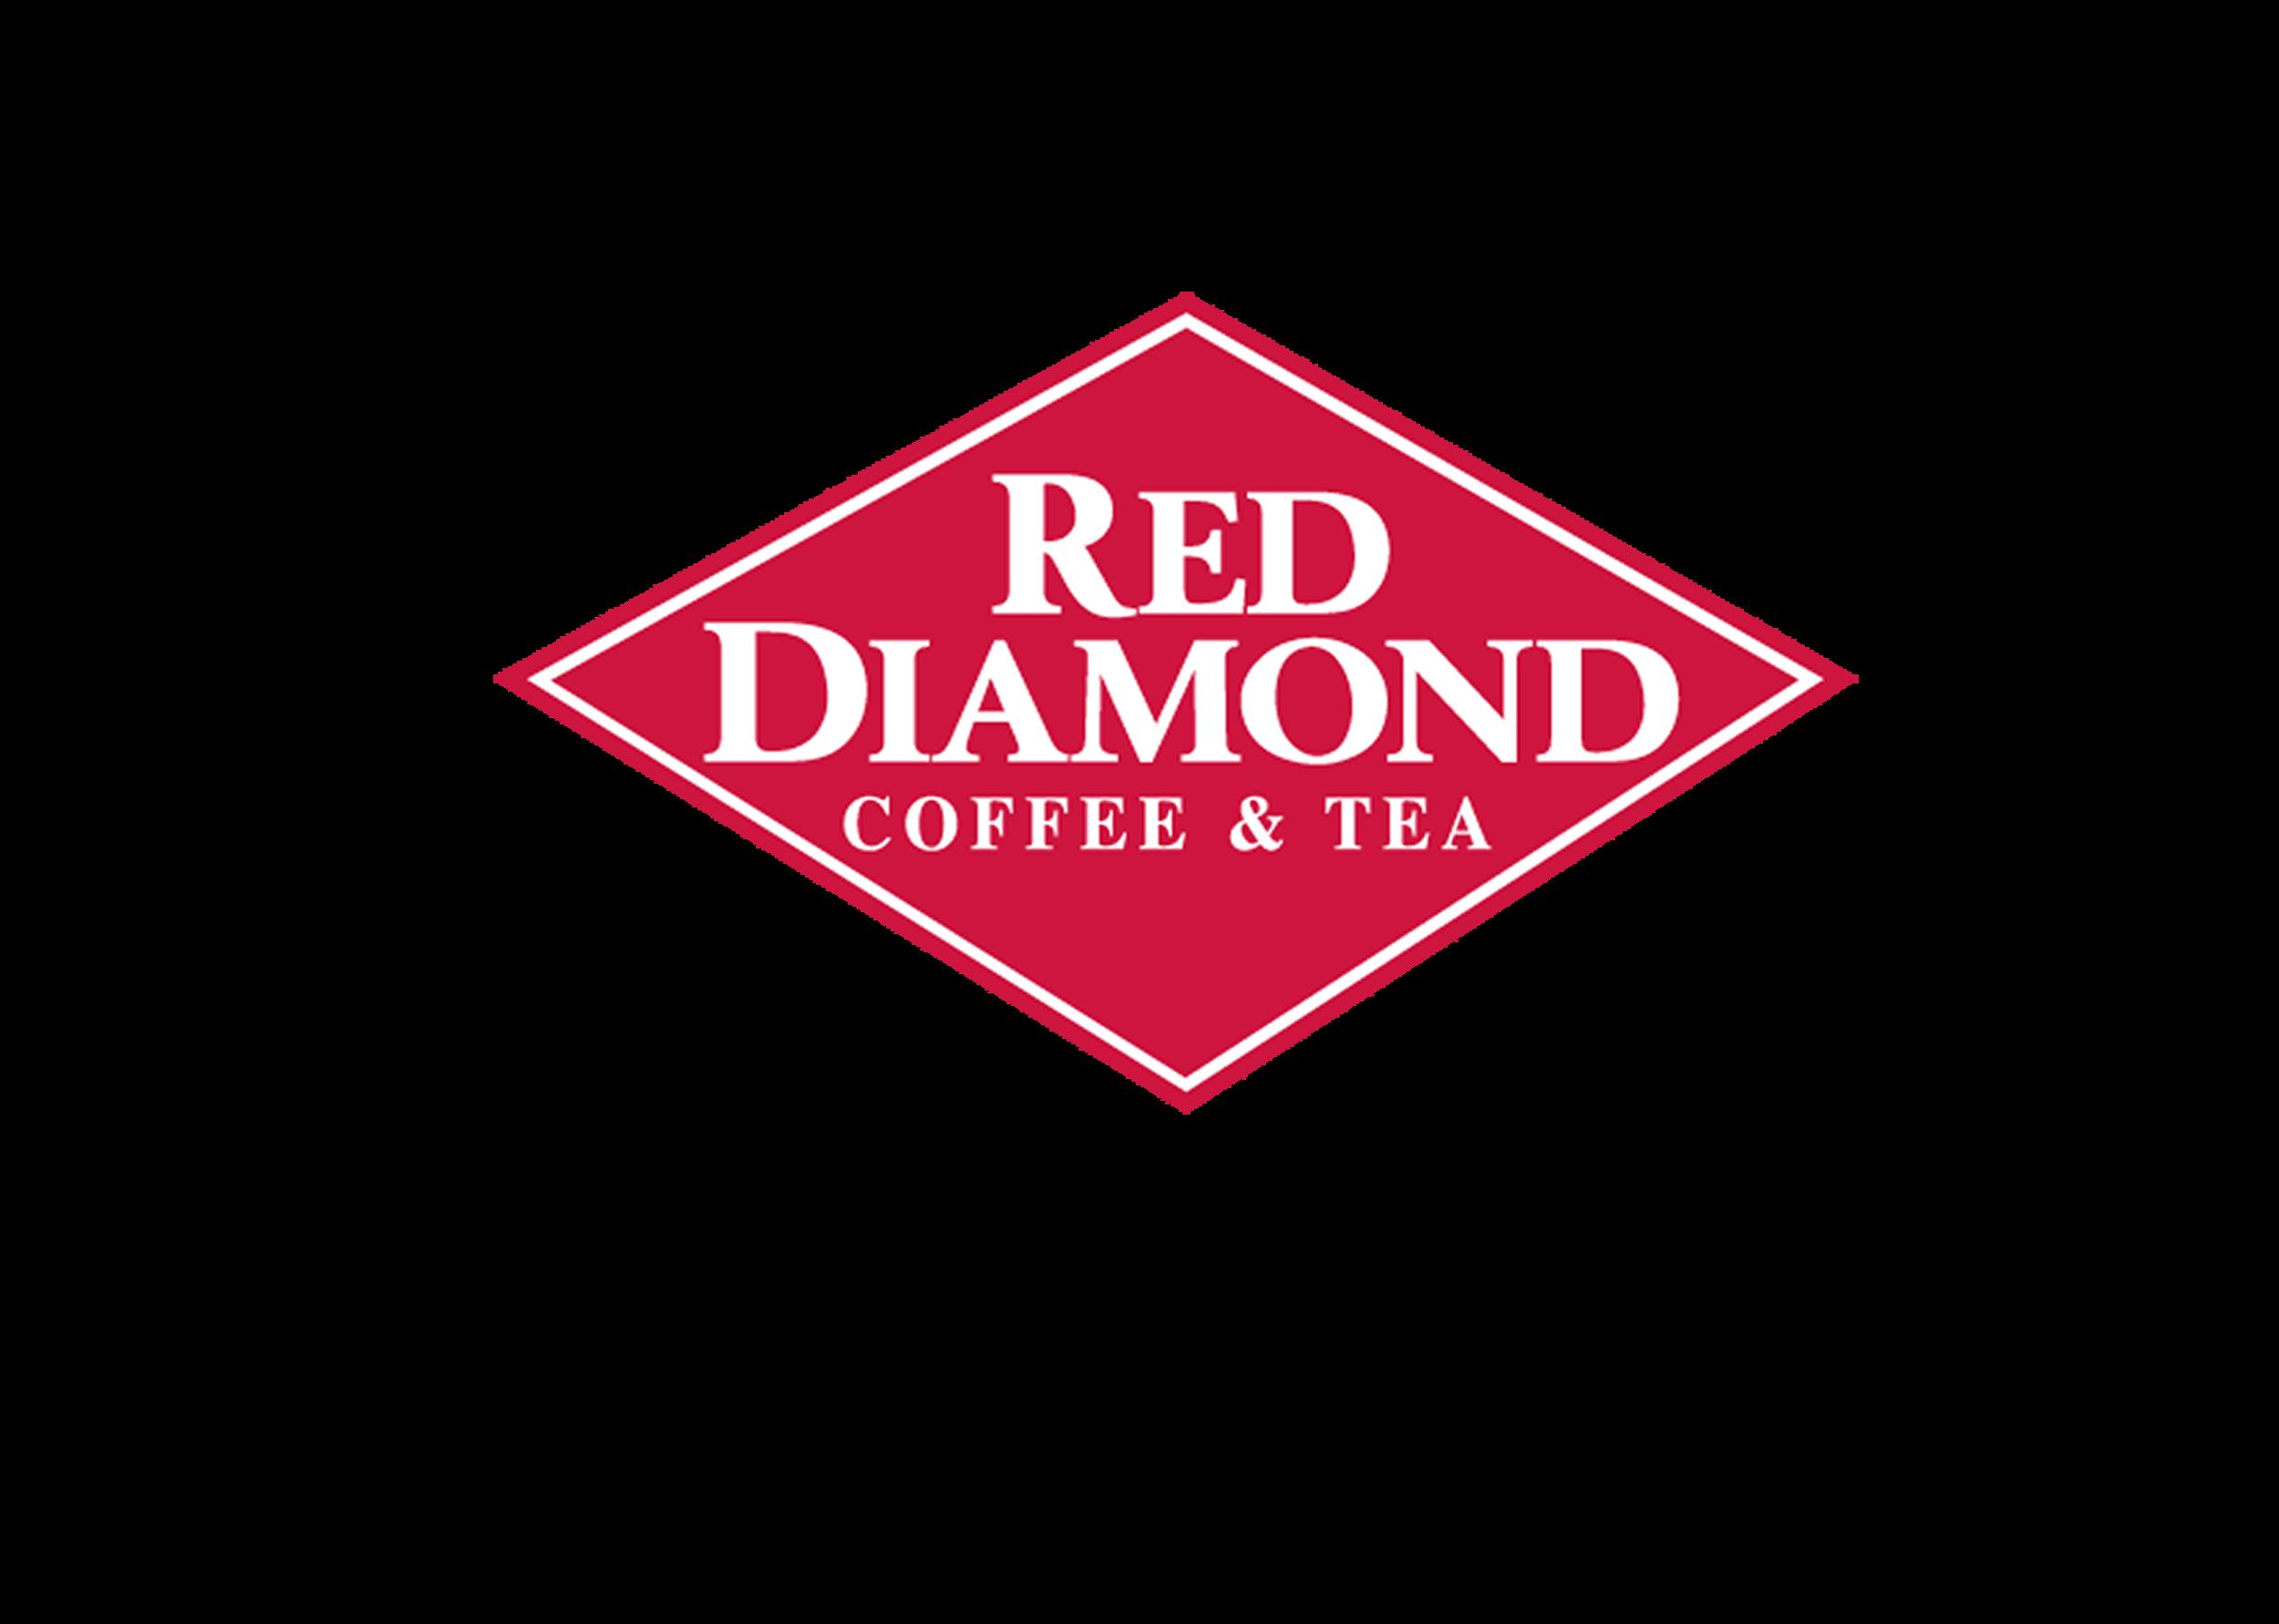 RD_CoffeeTea_VertTag_RGB.png